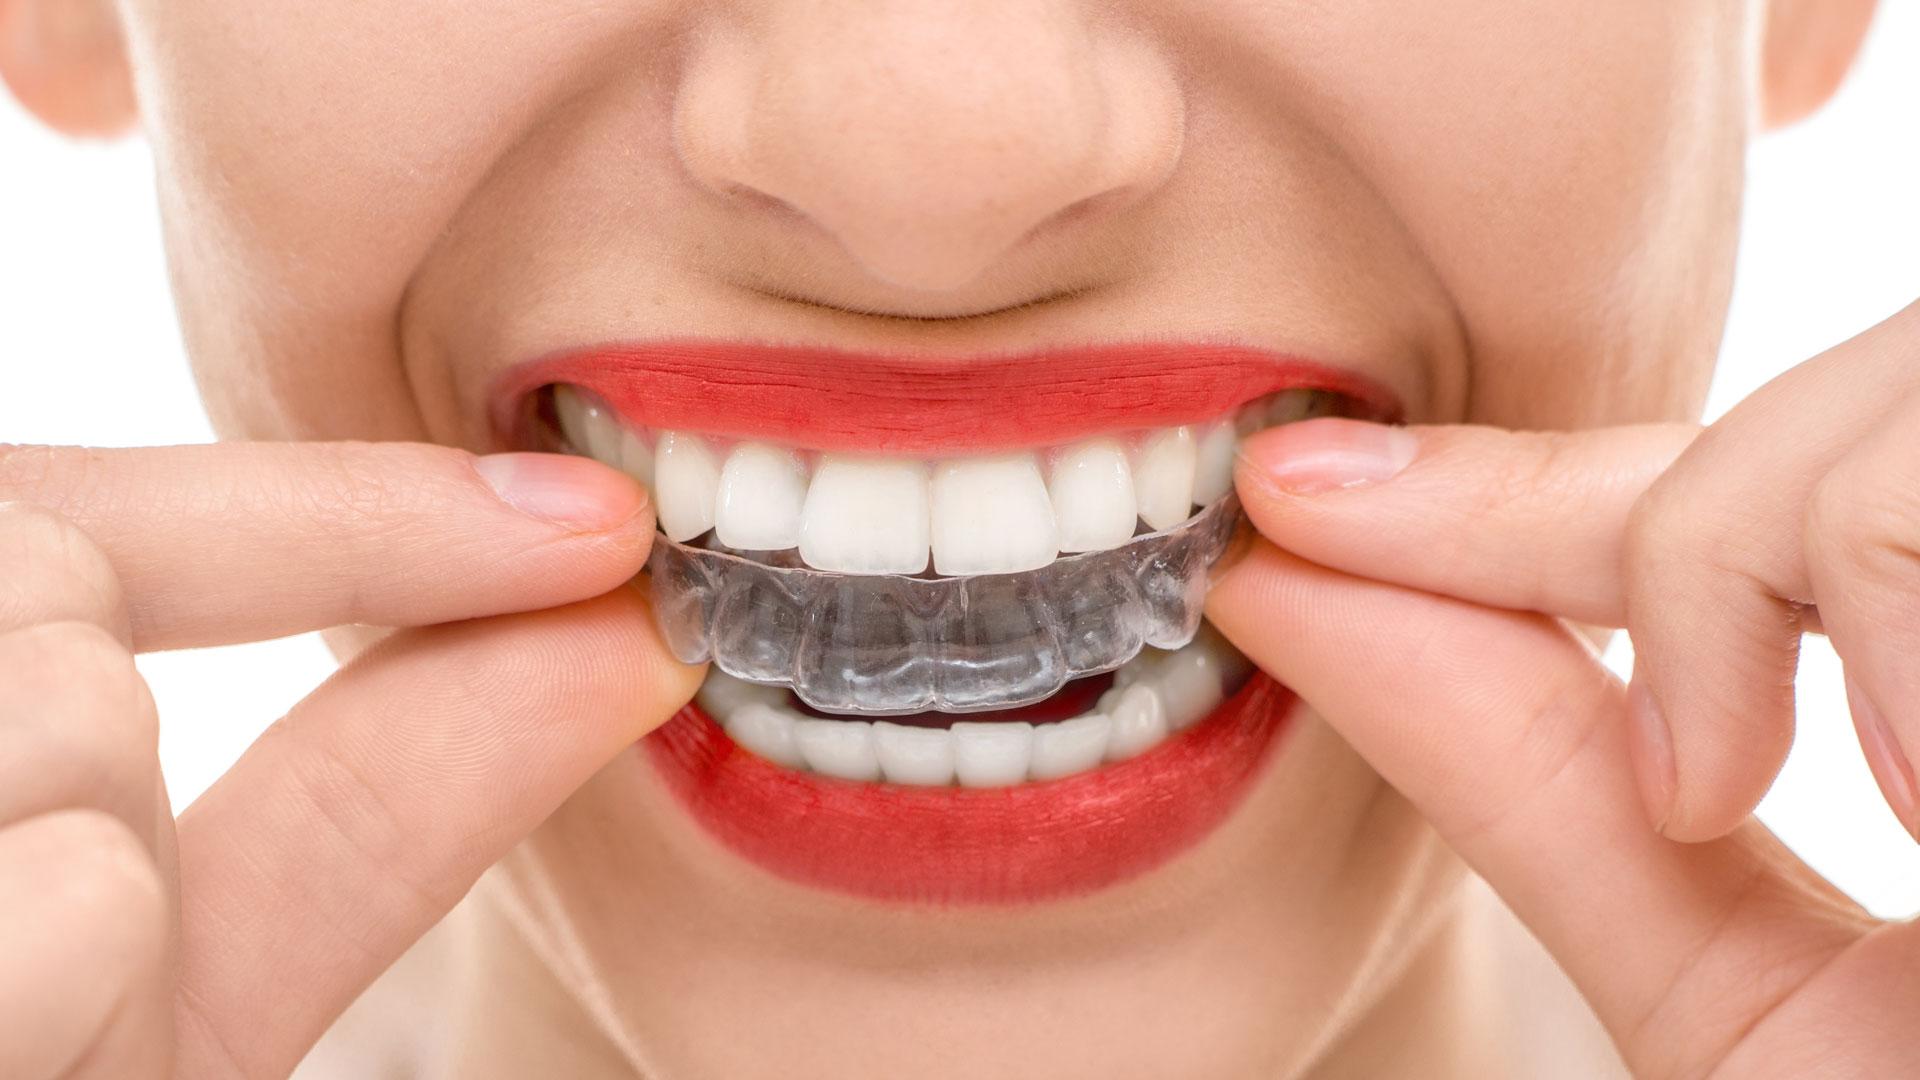 studio-dentistico-odontoiatrico-emanuelli-san-remo-liguria19-ortodonzia